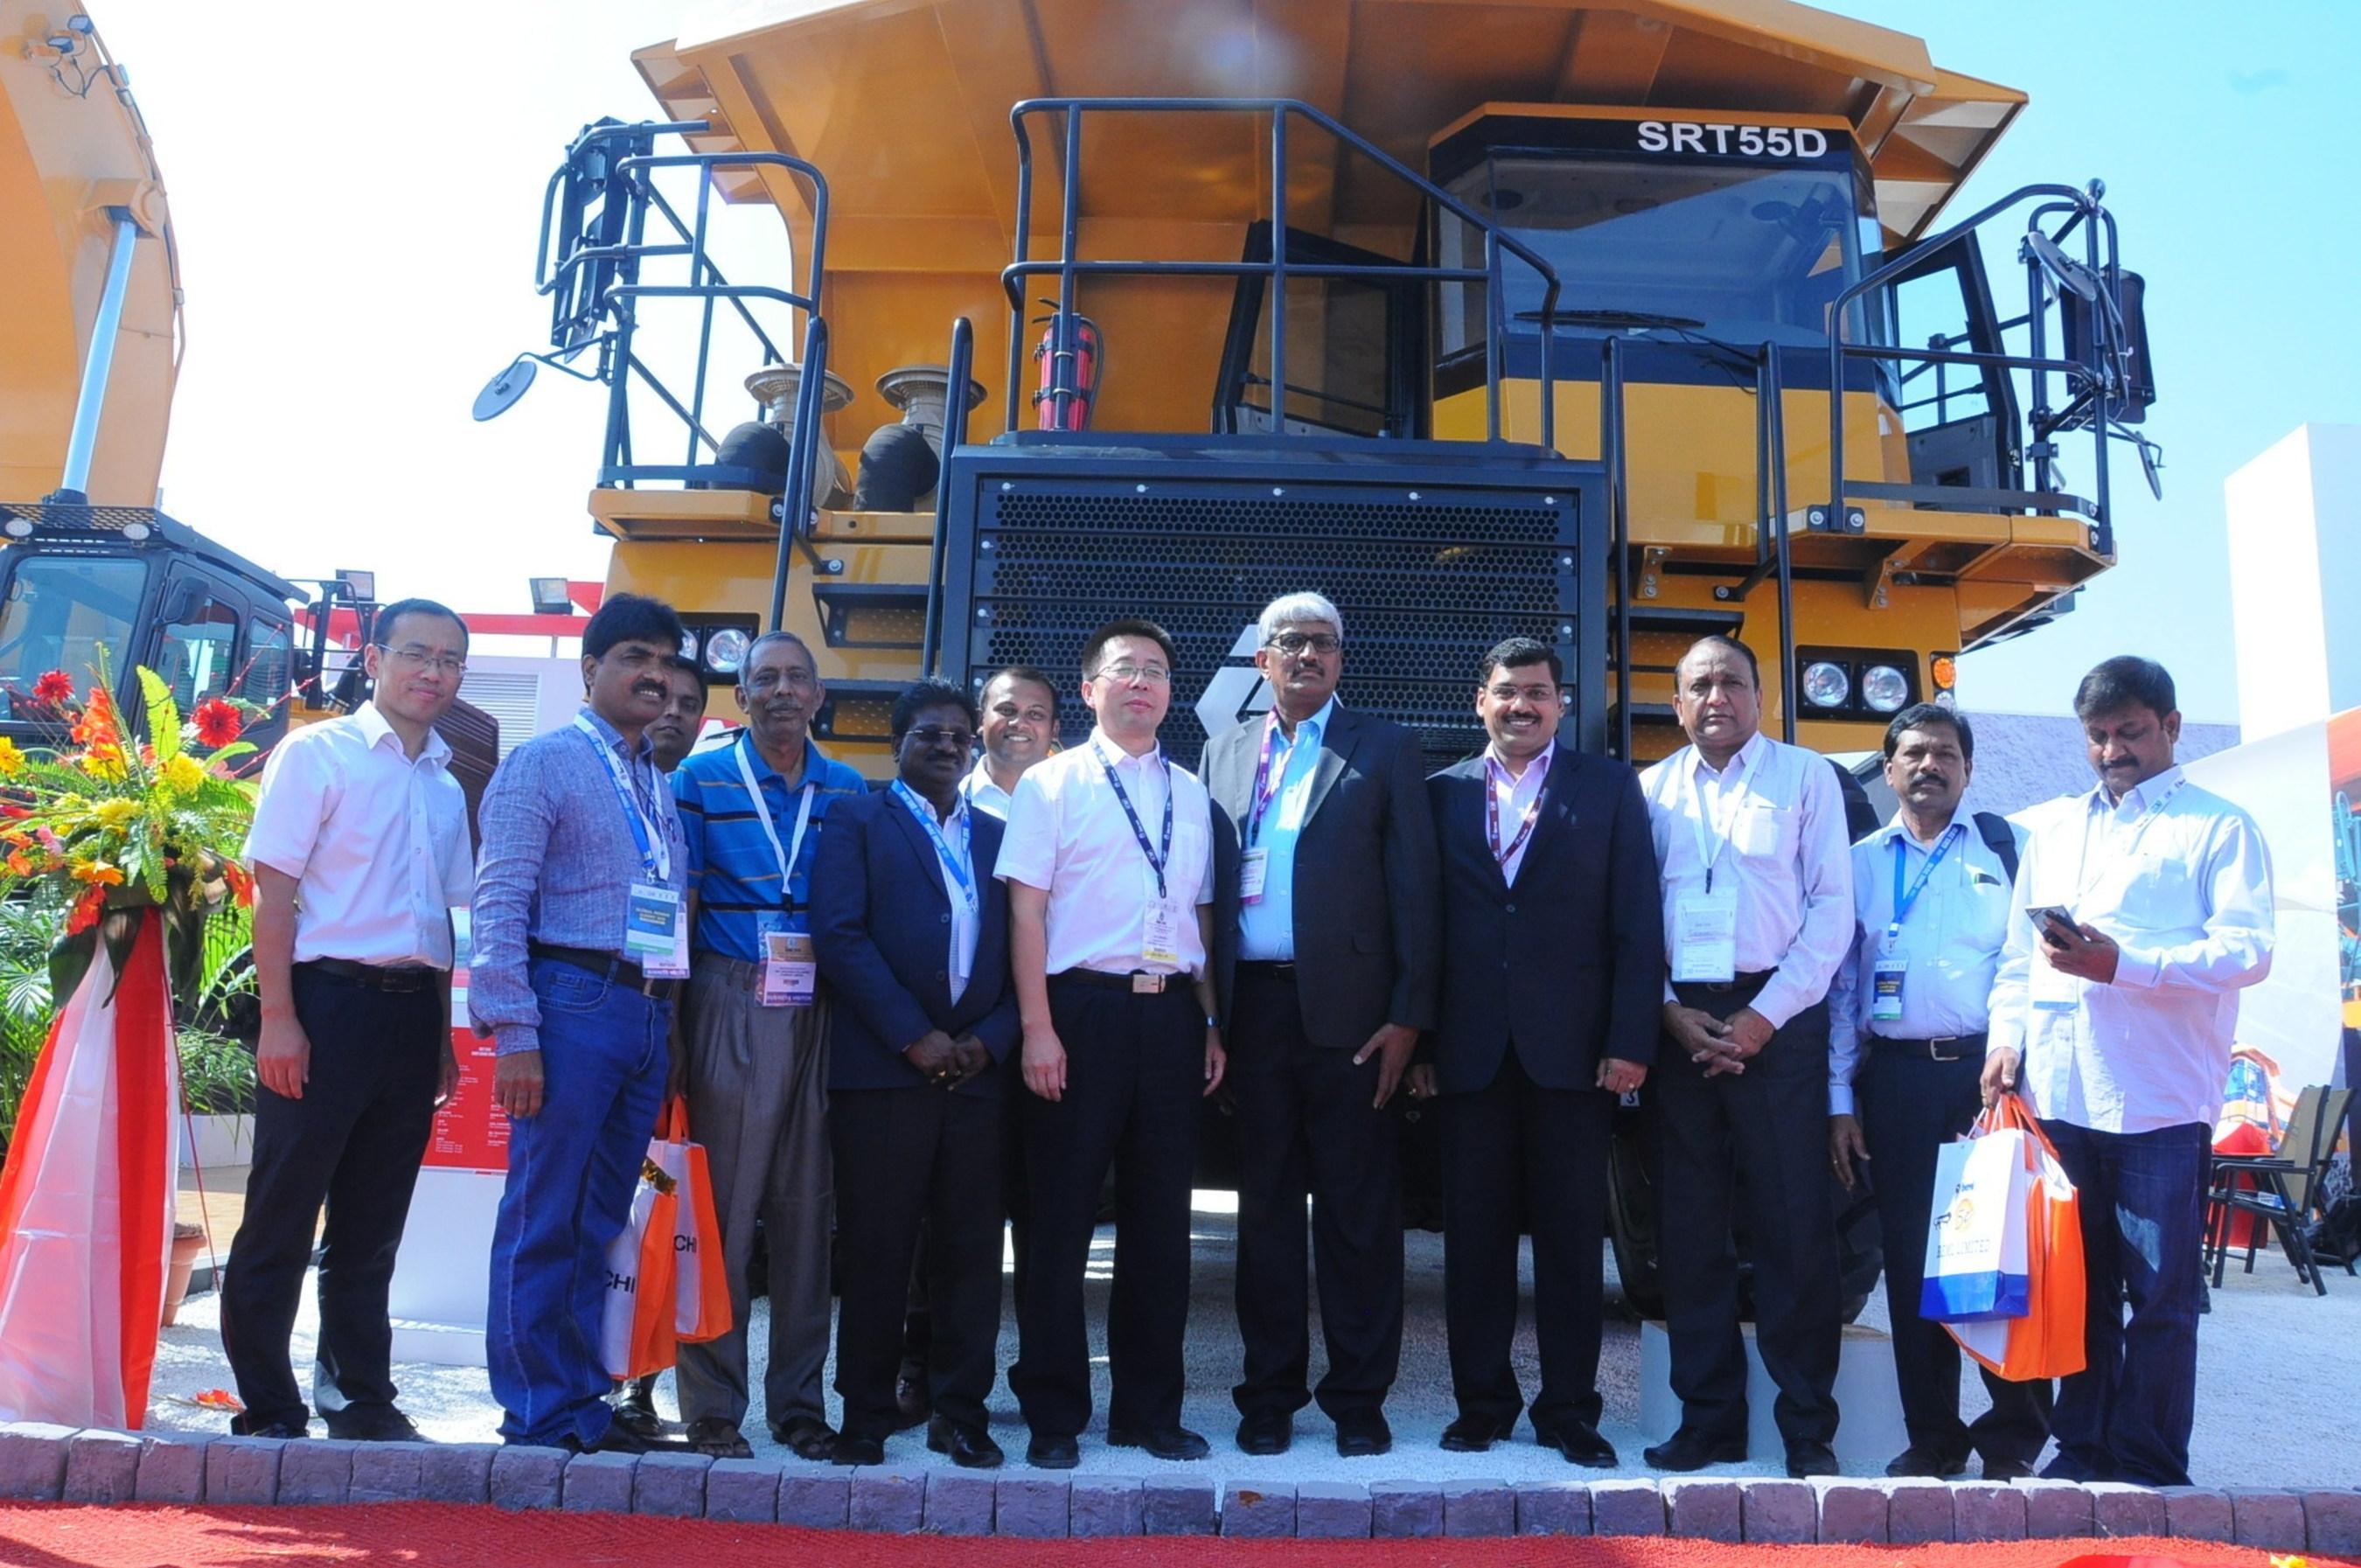 Left to Right : Mr. Man Juncheng, Head - R&D, SANY Mining Equipment Co Ltd, Mr. B. Ramesh Kumar - Director - Operations, The Singareni Collieries Company Limited, Mr. Deepak Garg - CEO , SANY Heavy Industry India Pvt Ltd